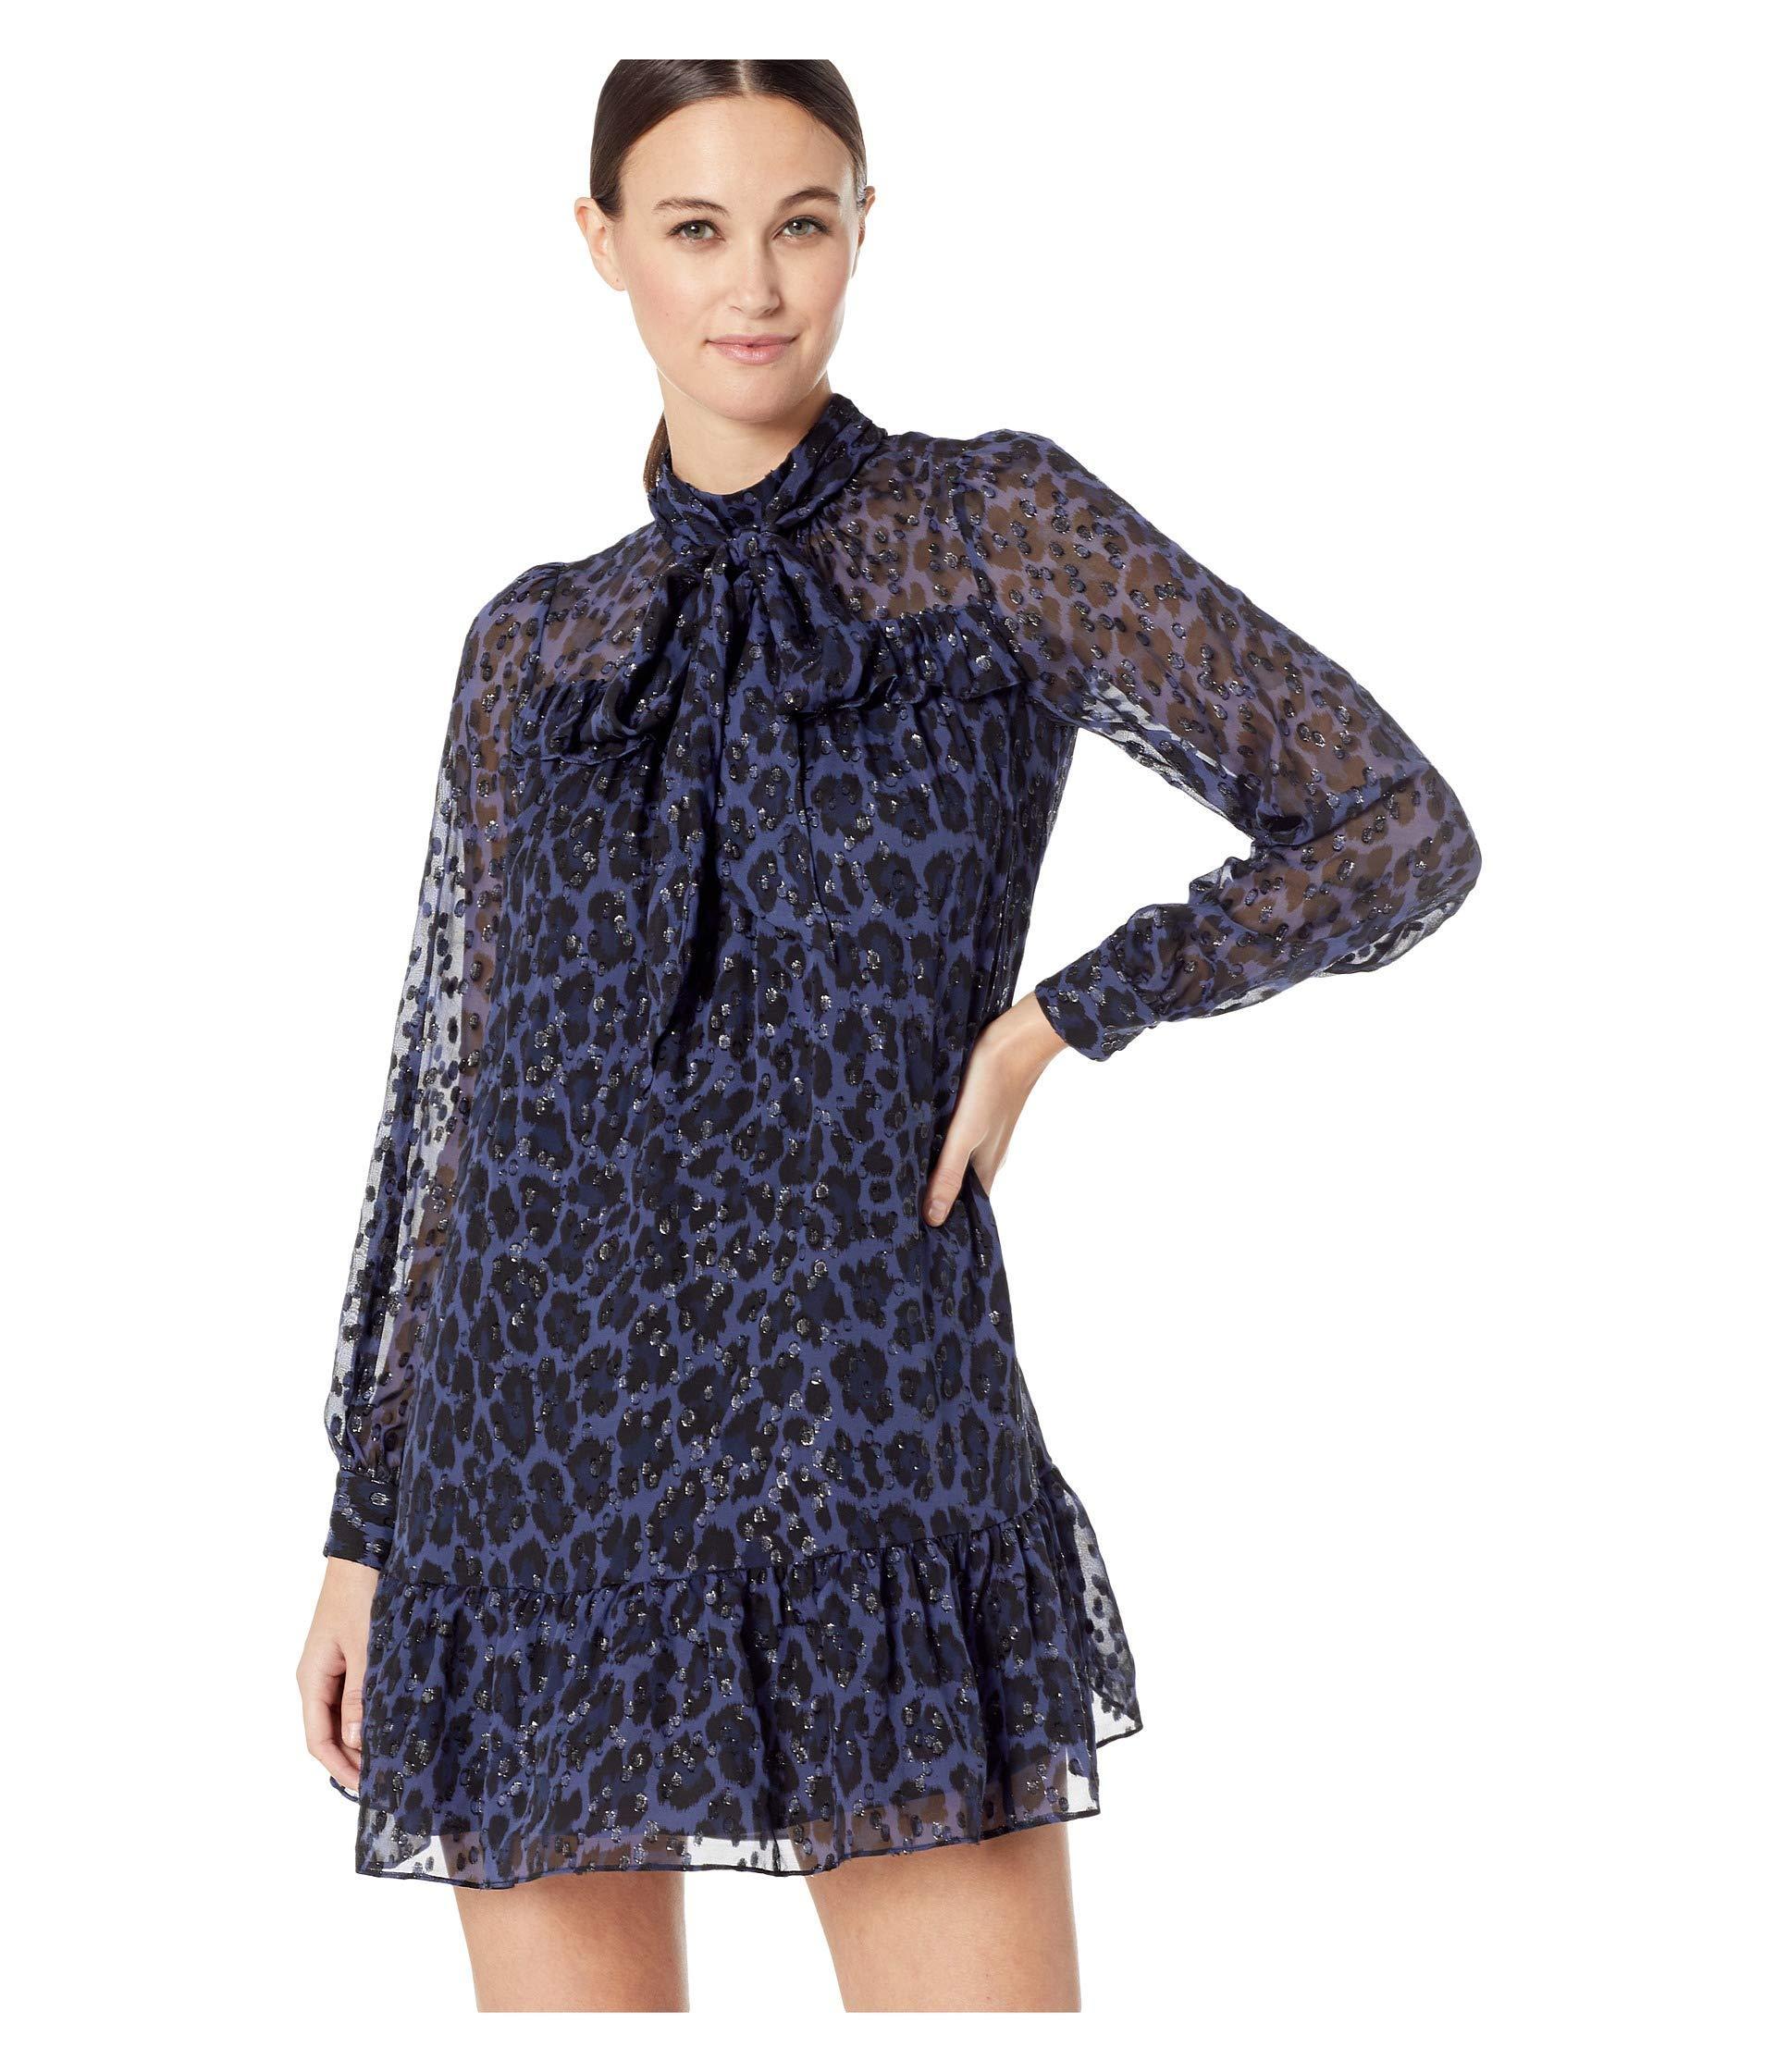 fcc70060c08d Kate Spade Wild Ones Leopard Clip Dot Mini Dress in Blue - Lyst